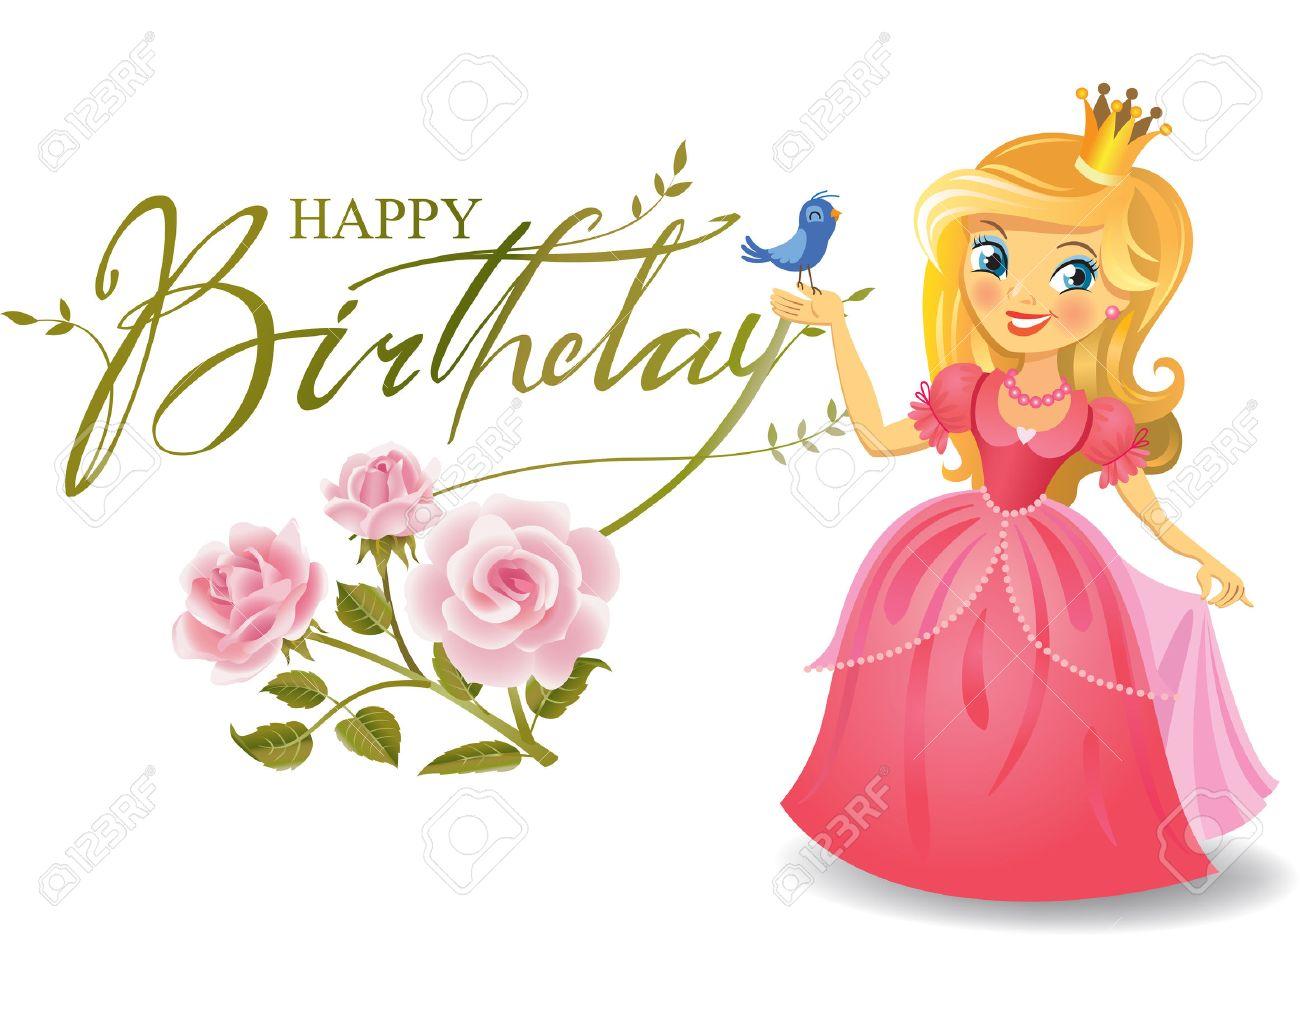 Happy birthday stock photos royalty free happy birthday images happy birthday princess greeting card illustration izmirmasajfo Images